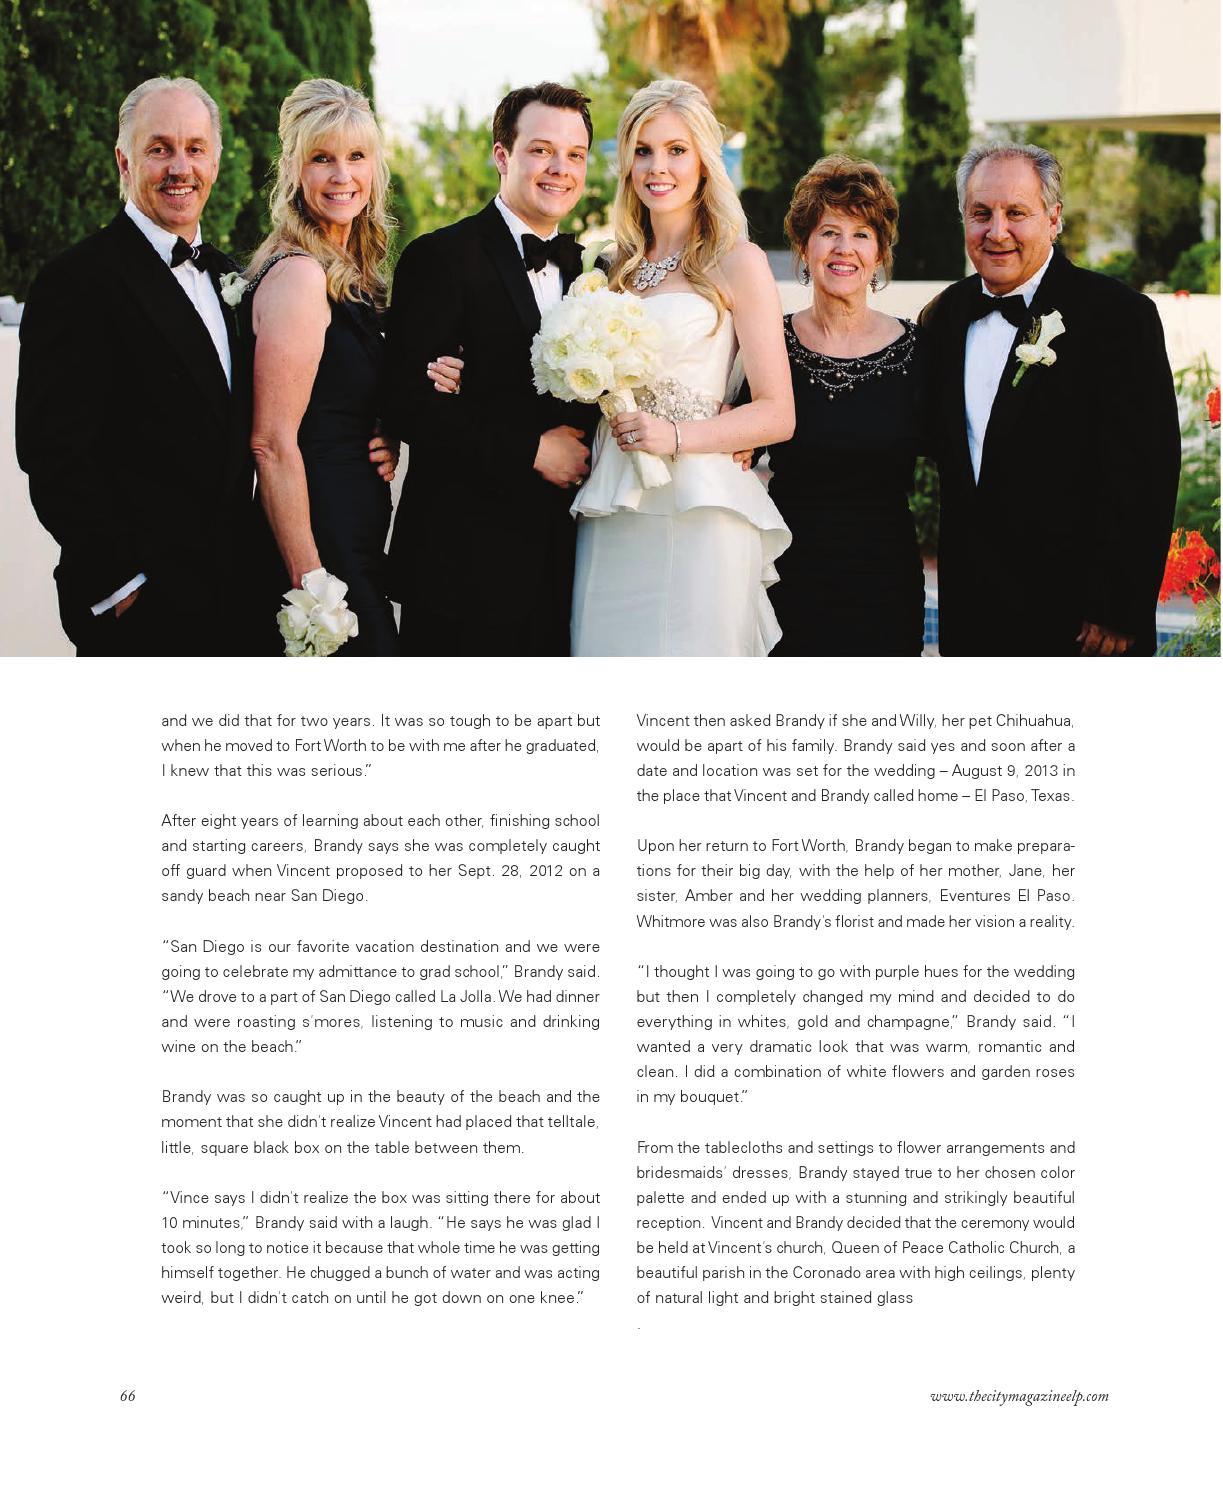 Thecity Weddings 2014 By Thecity Magazine El Pasolas Cruces Issuu